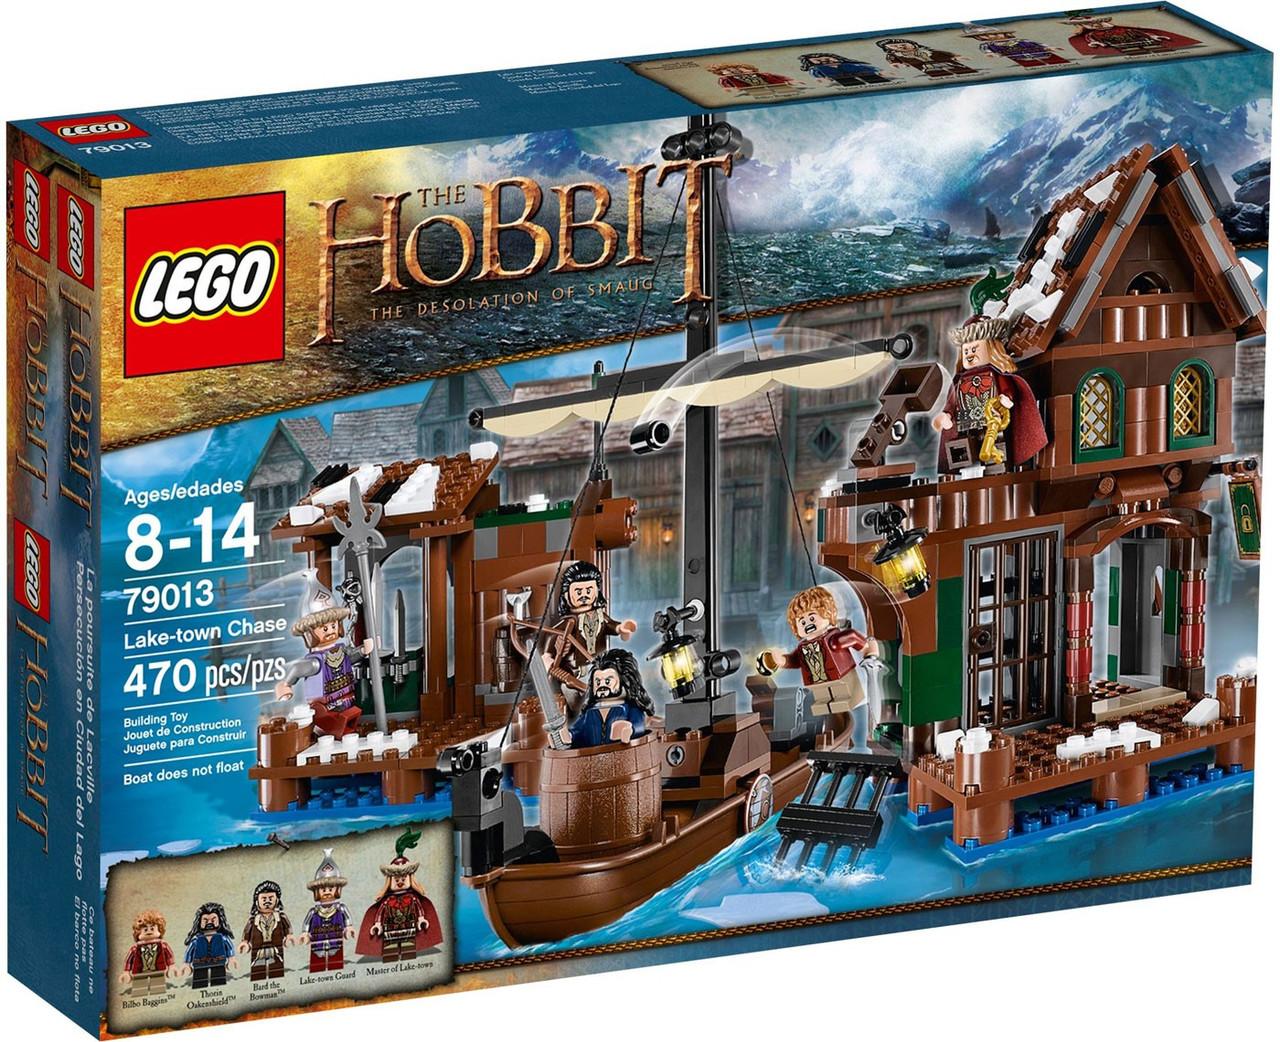 LEGO The Hobbit Laketown Chase Set #79013